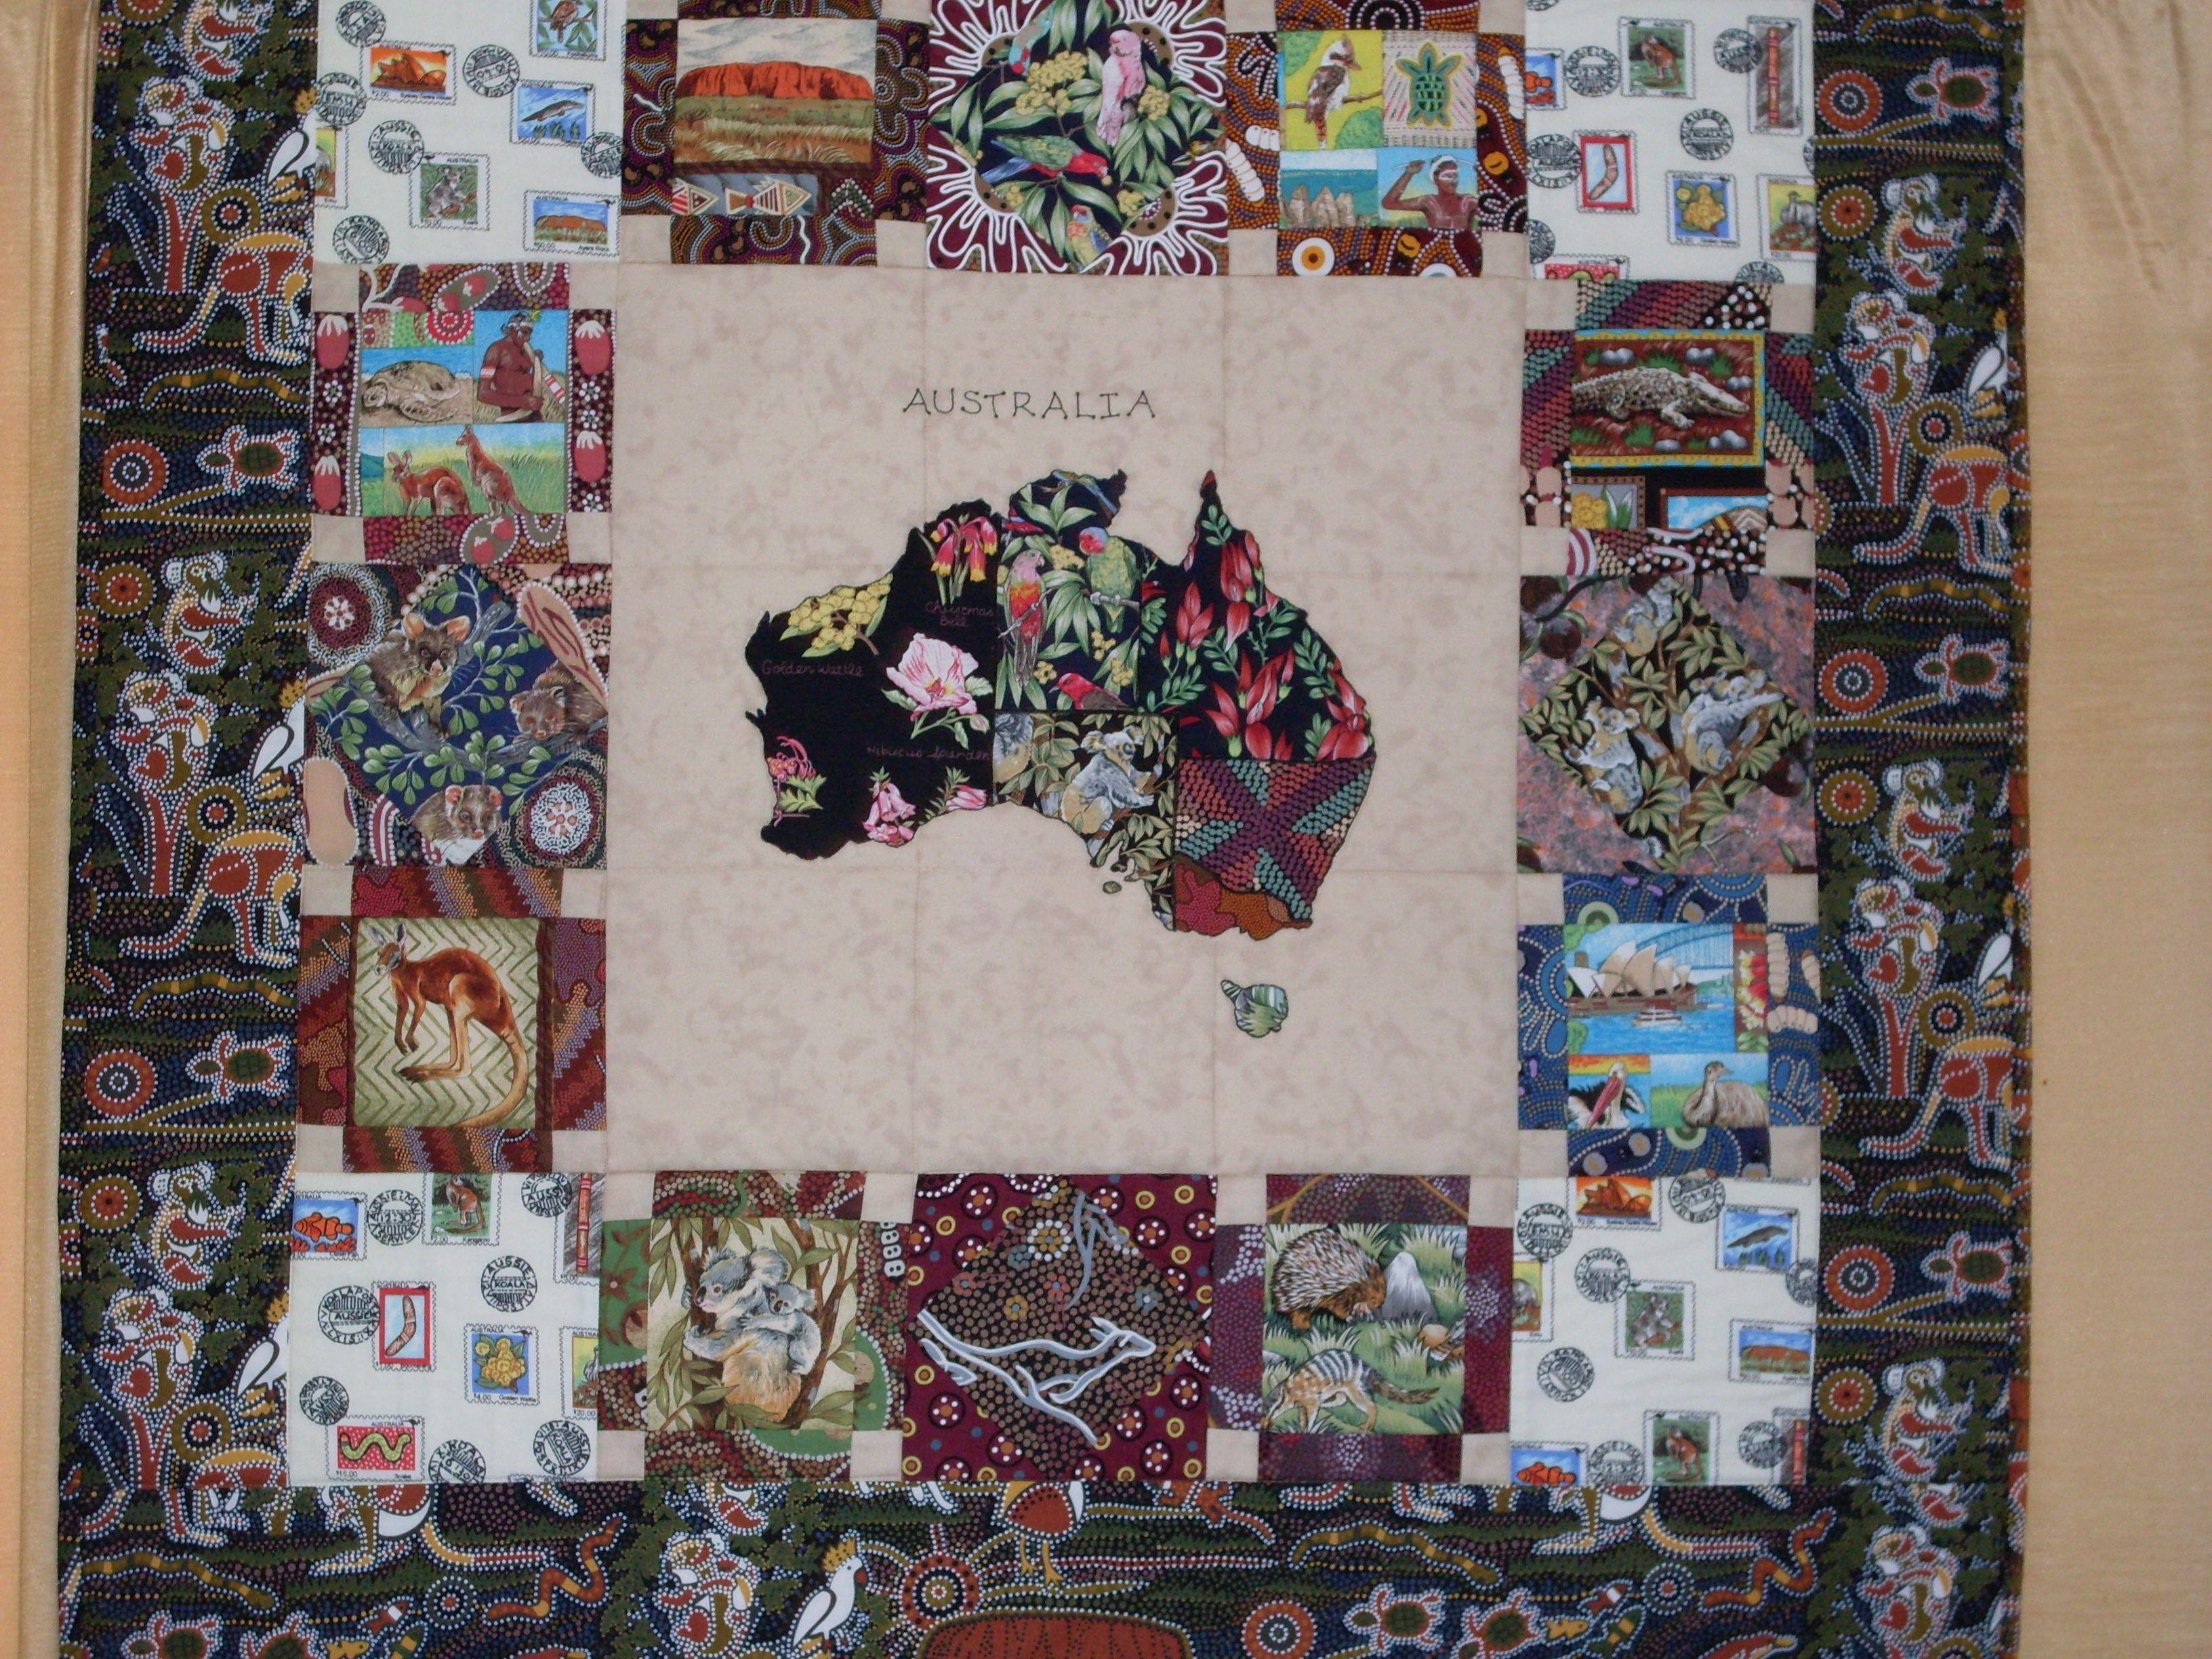 Australia Quilt   Quilting designs, Quilting crafts, Quilt patterns